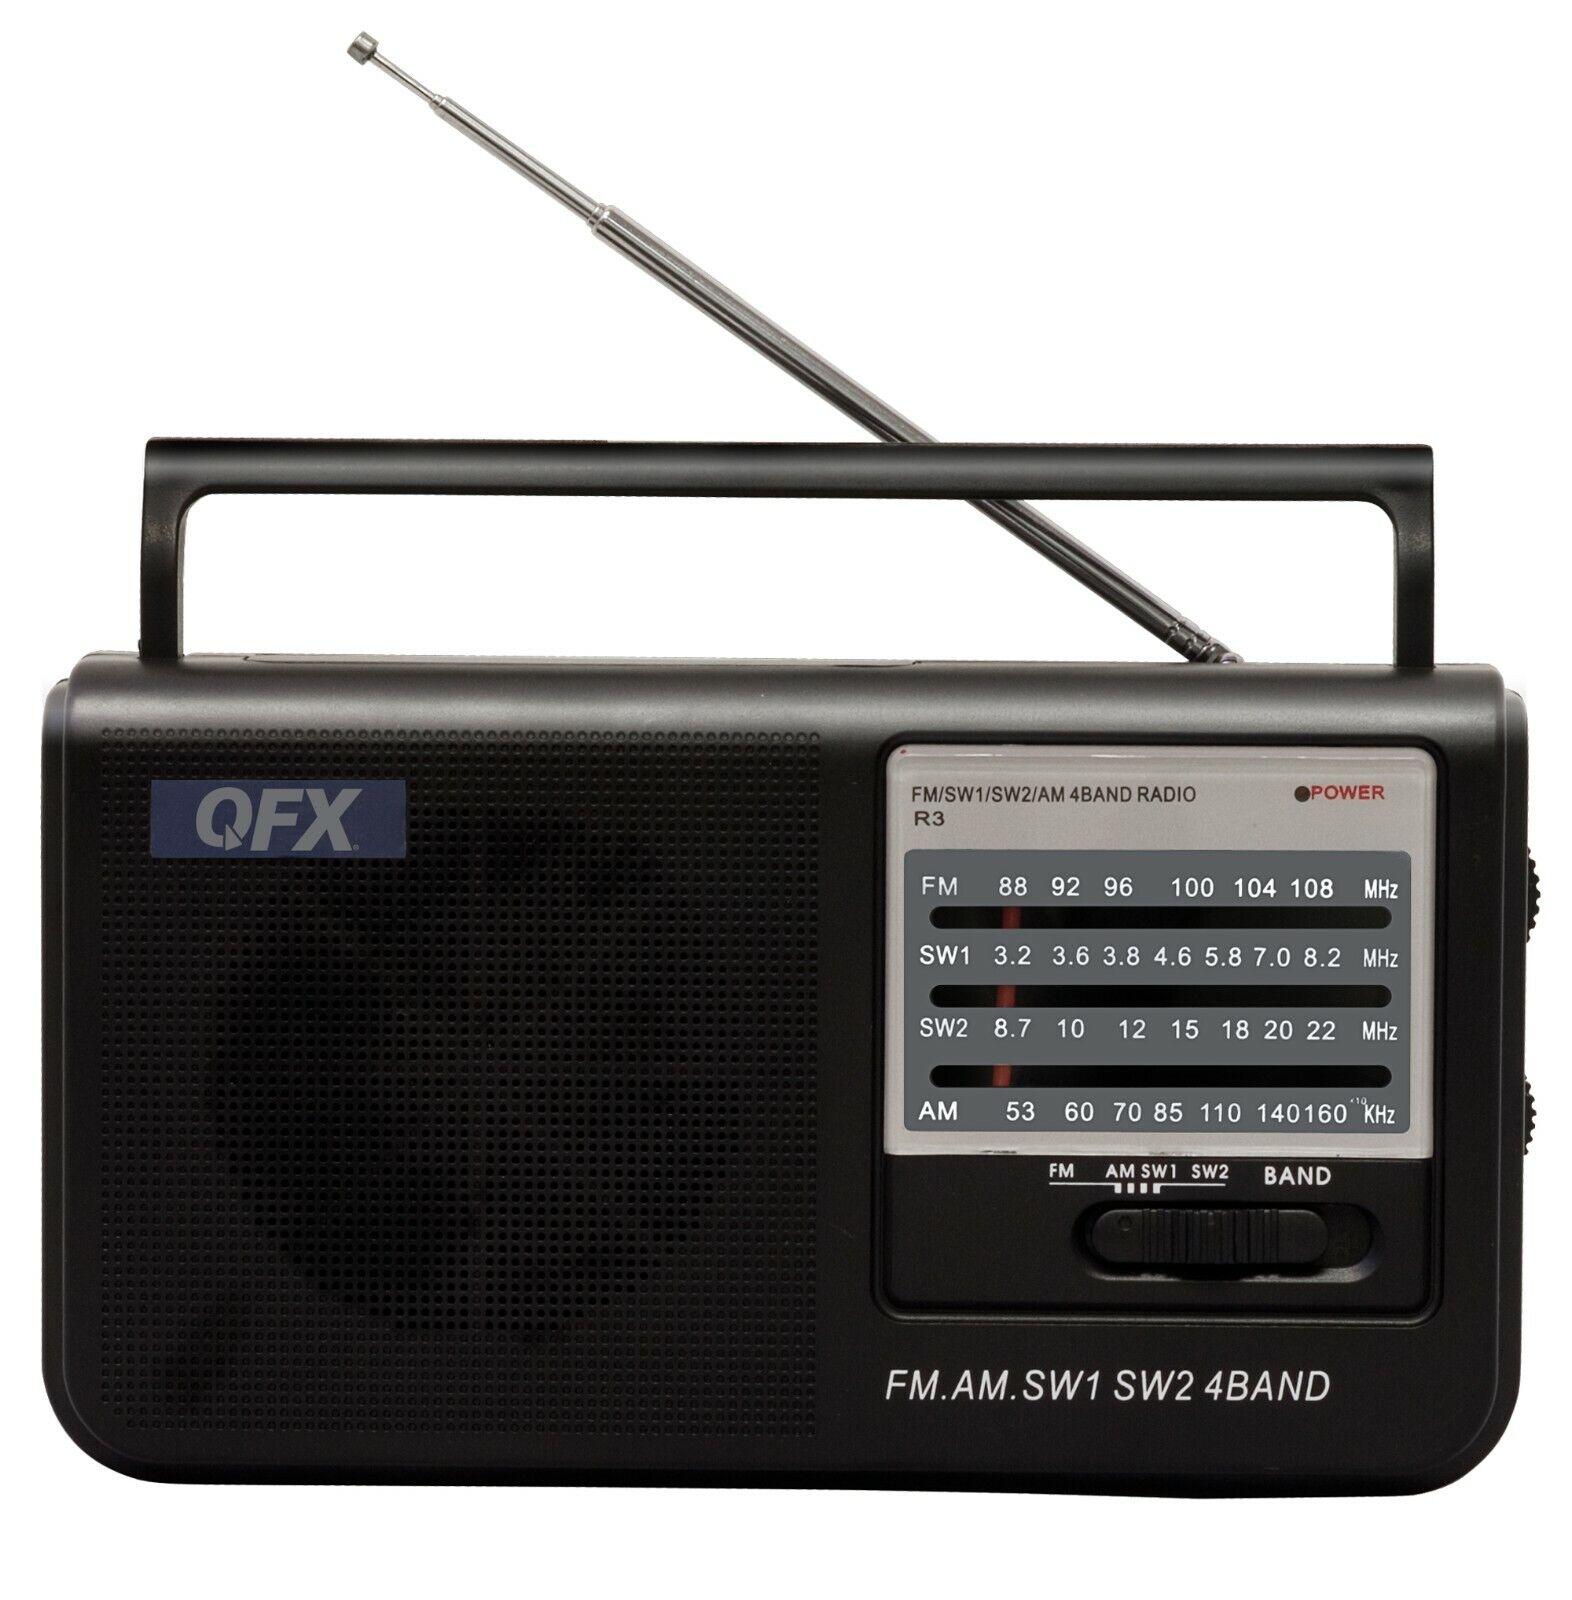 QFX R-3 AM/FM/SW1/SW2 Retro-Styled Handheld 4-Band Radio +LE